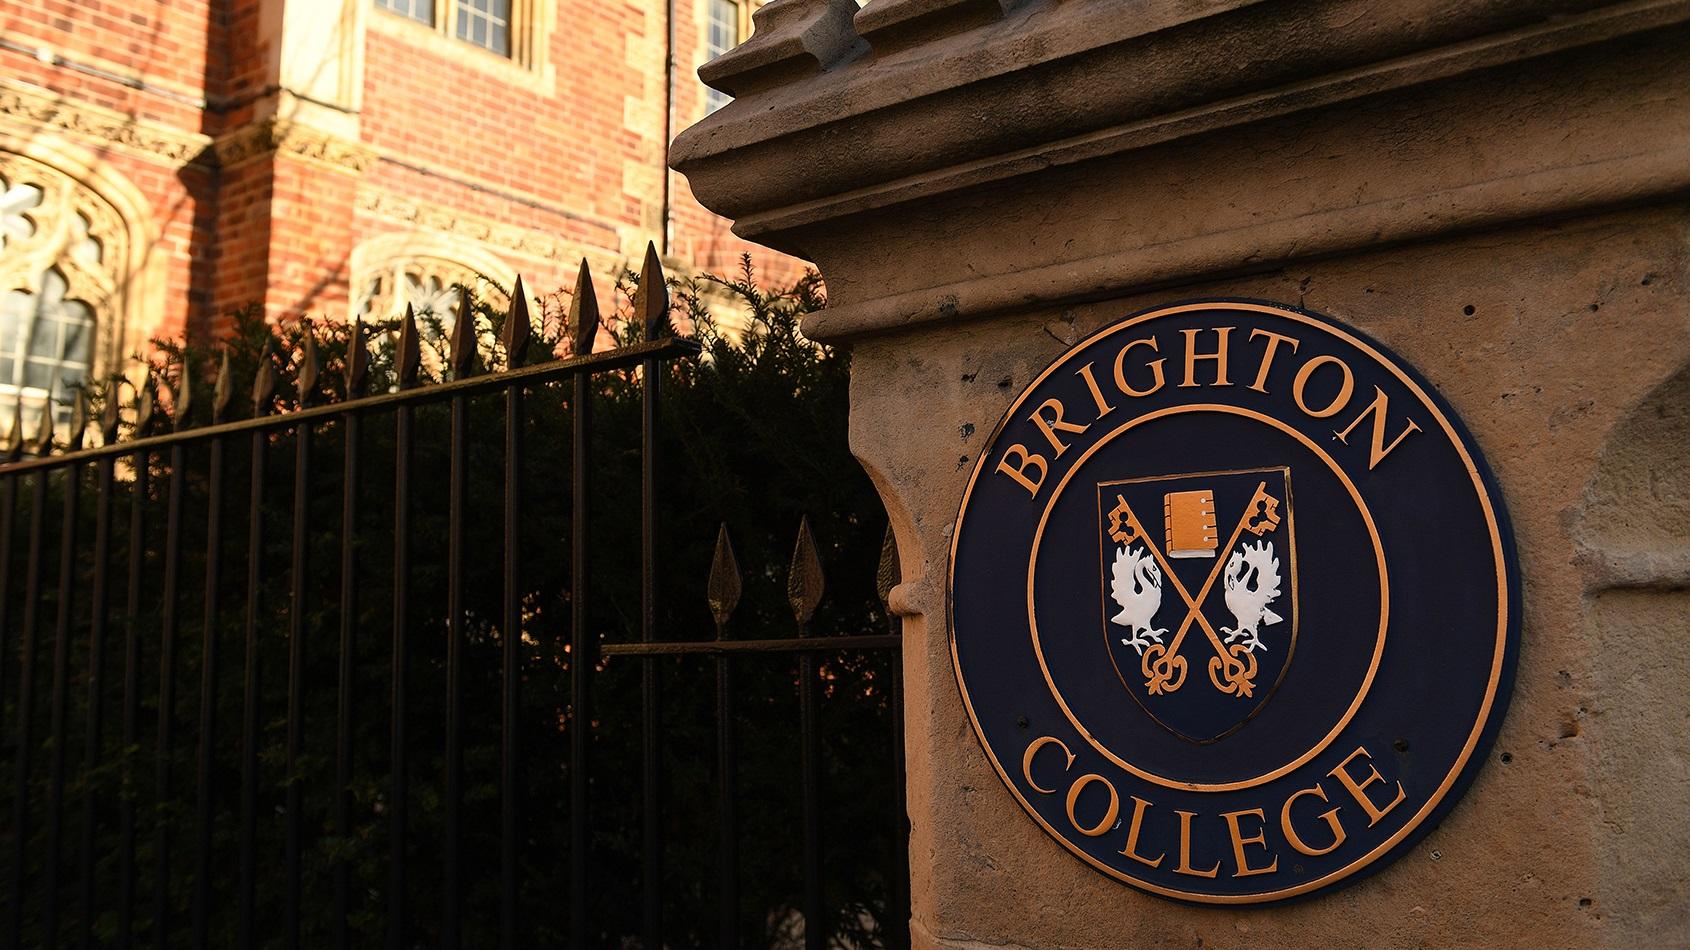 Brighton College is behind UK-Ghana literacy charity Reading Spots